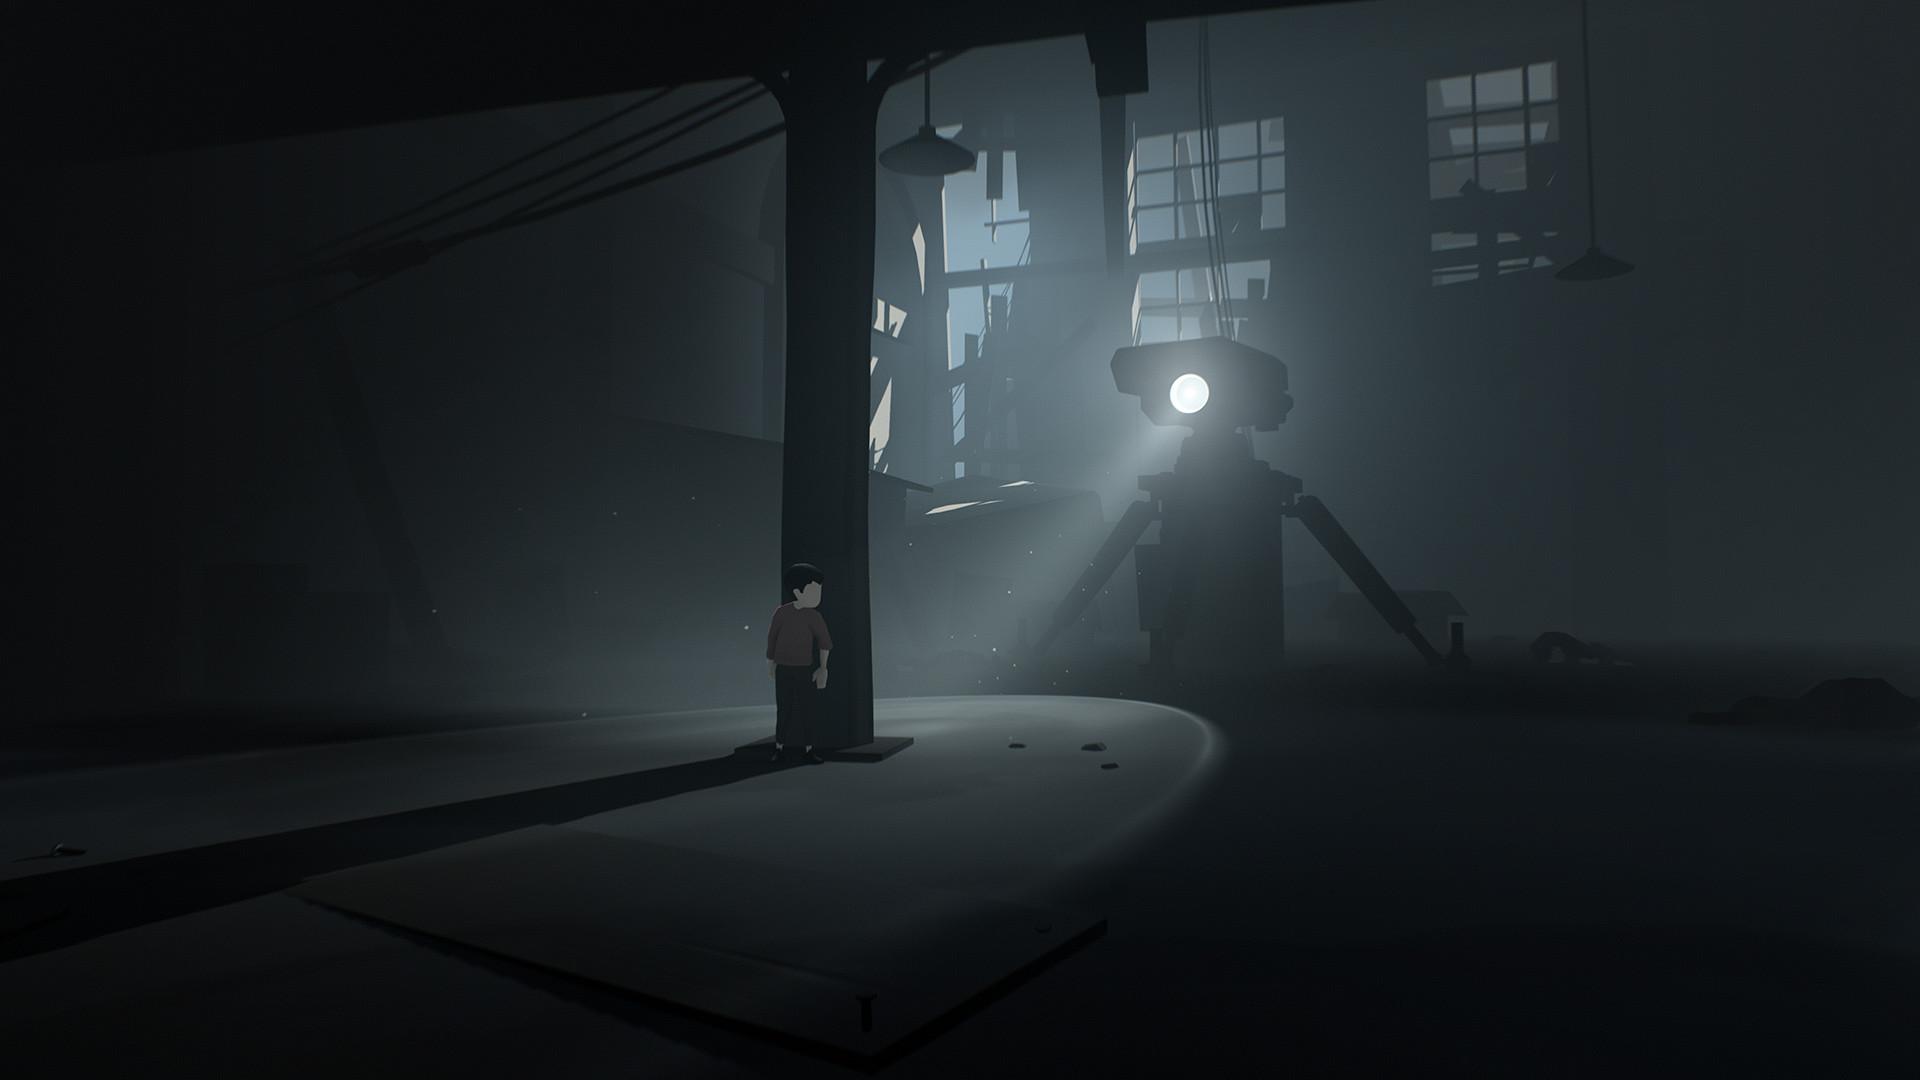 Inside image 2